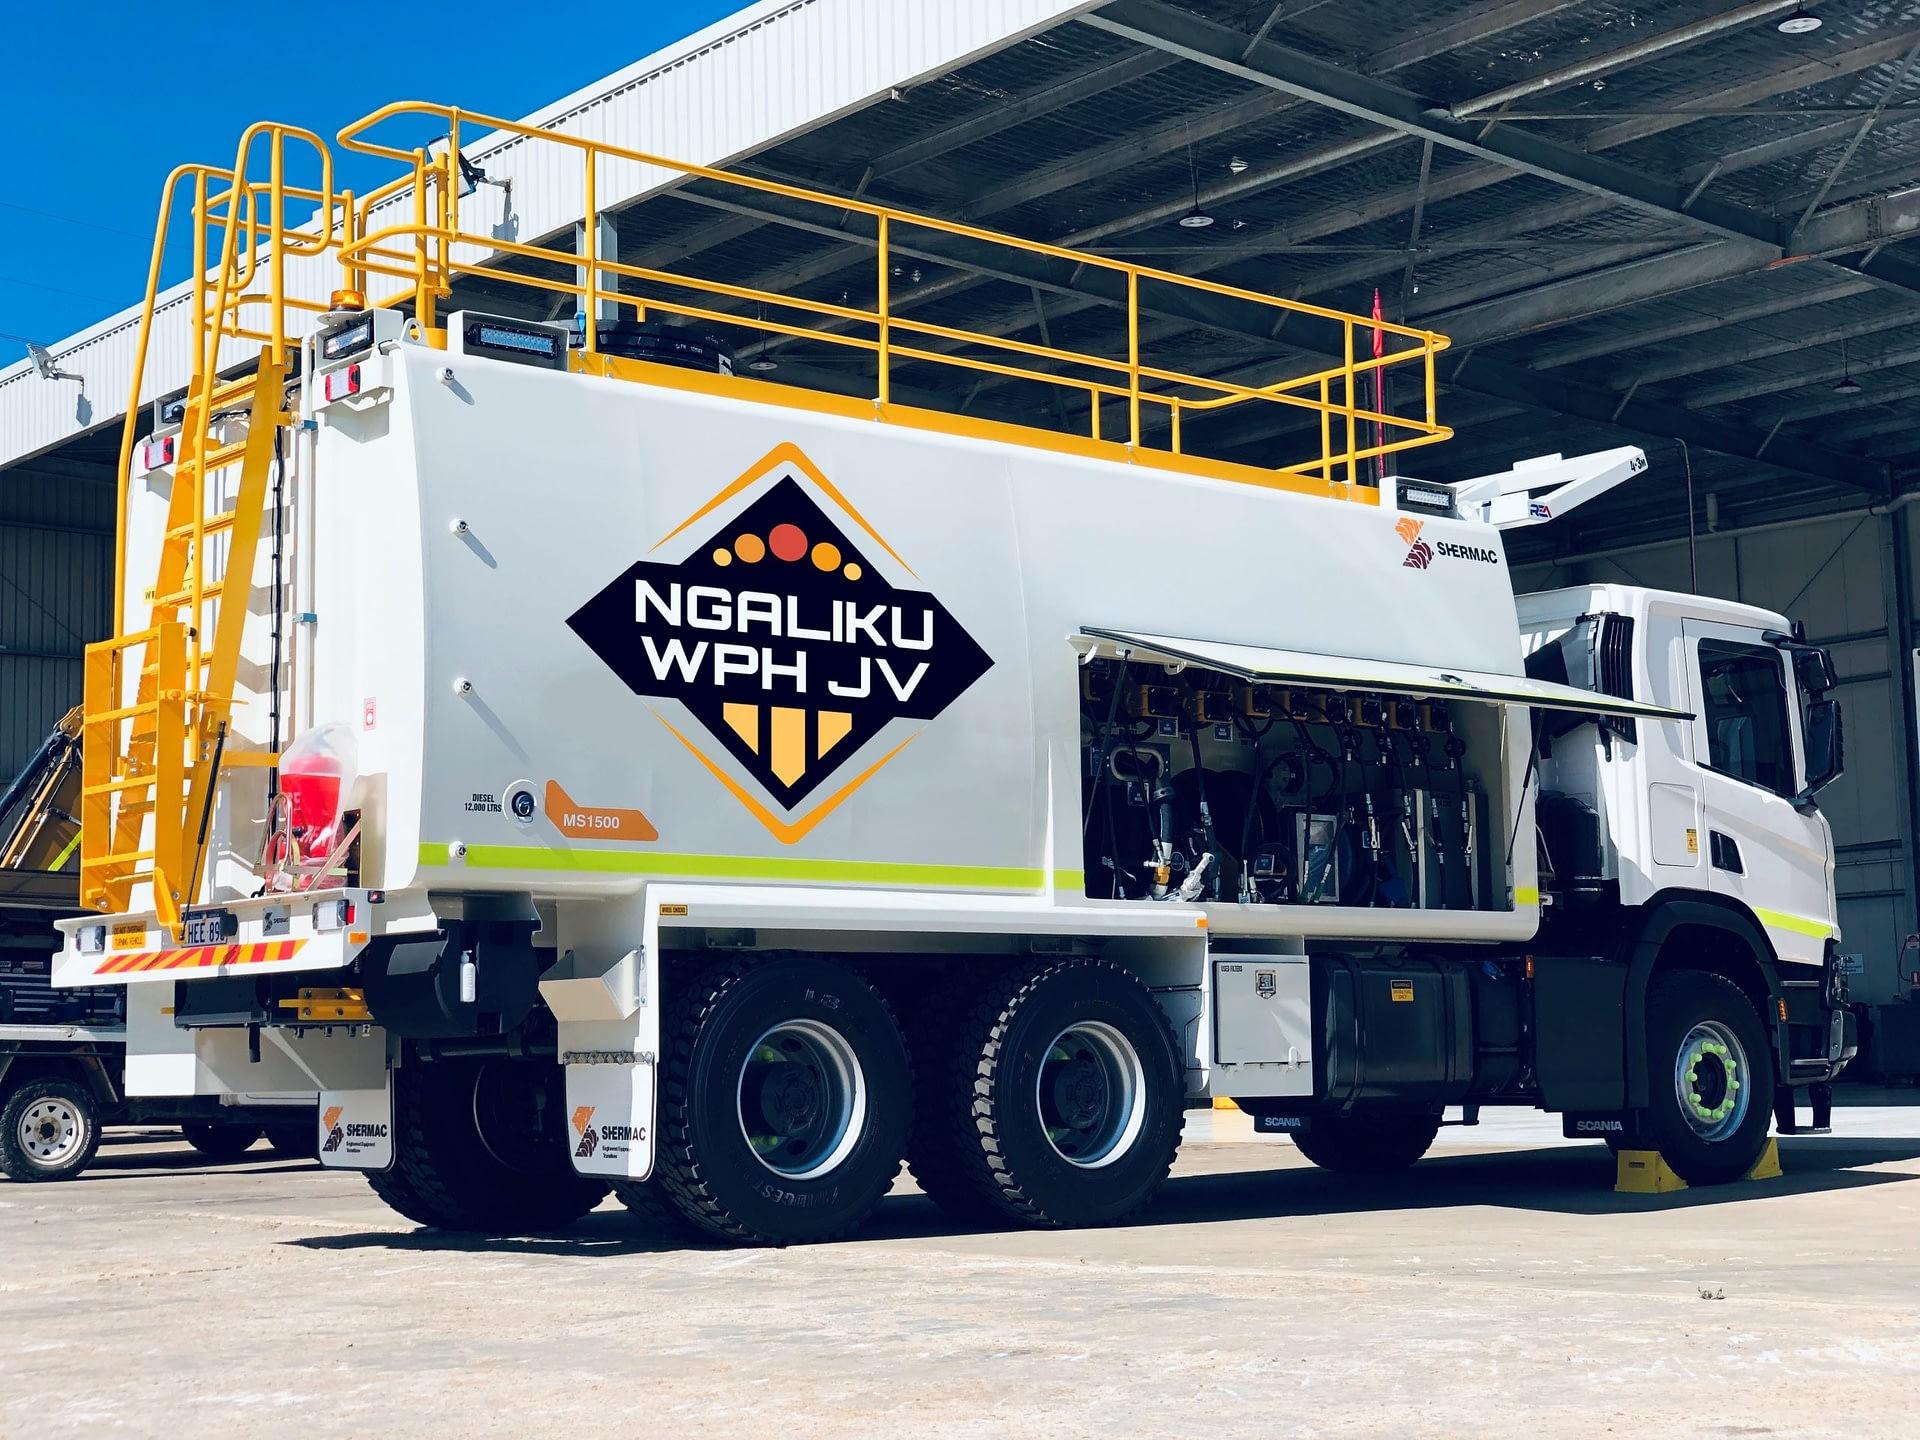 Isuzu 6 Wheel Service Truck - Ngaliku WPH JV